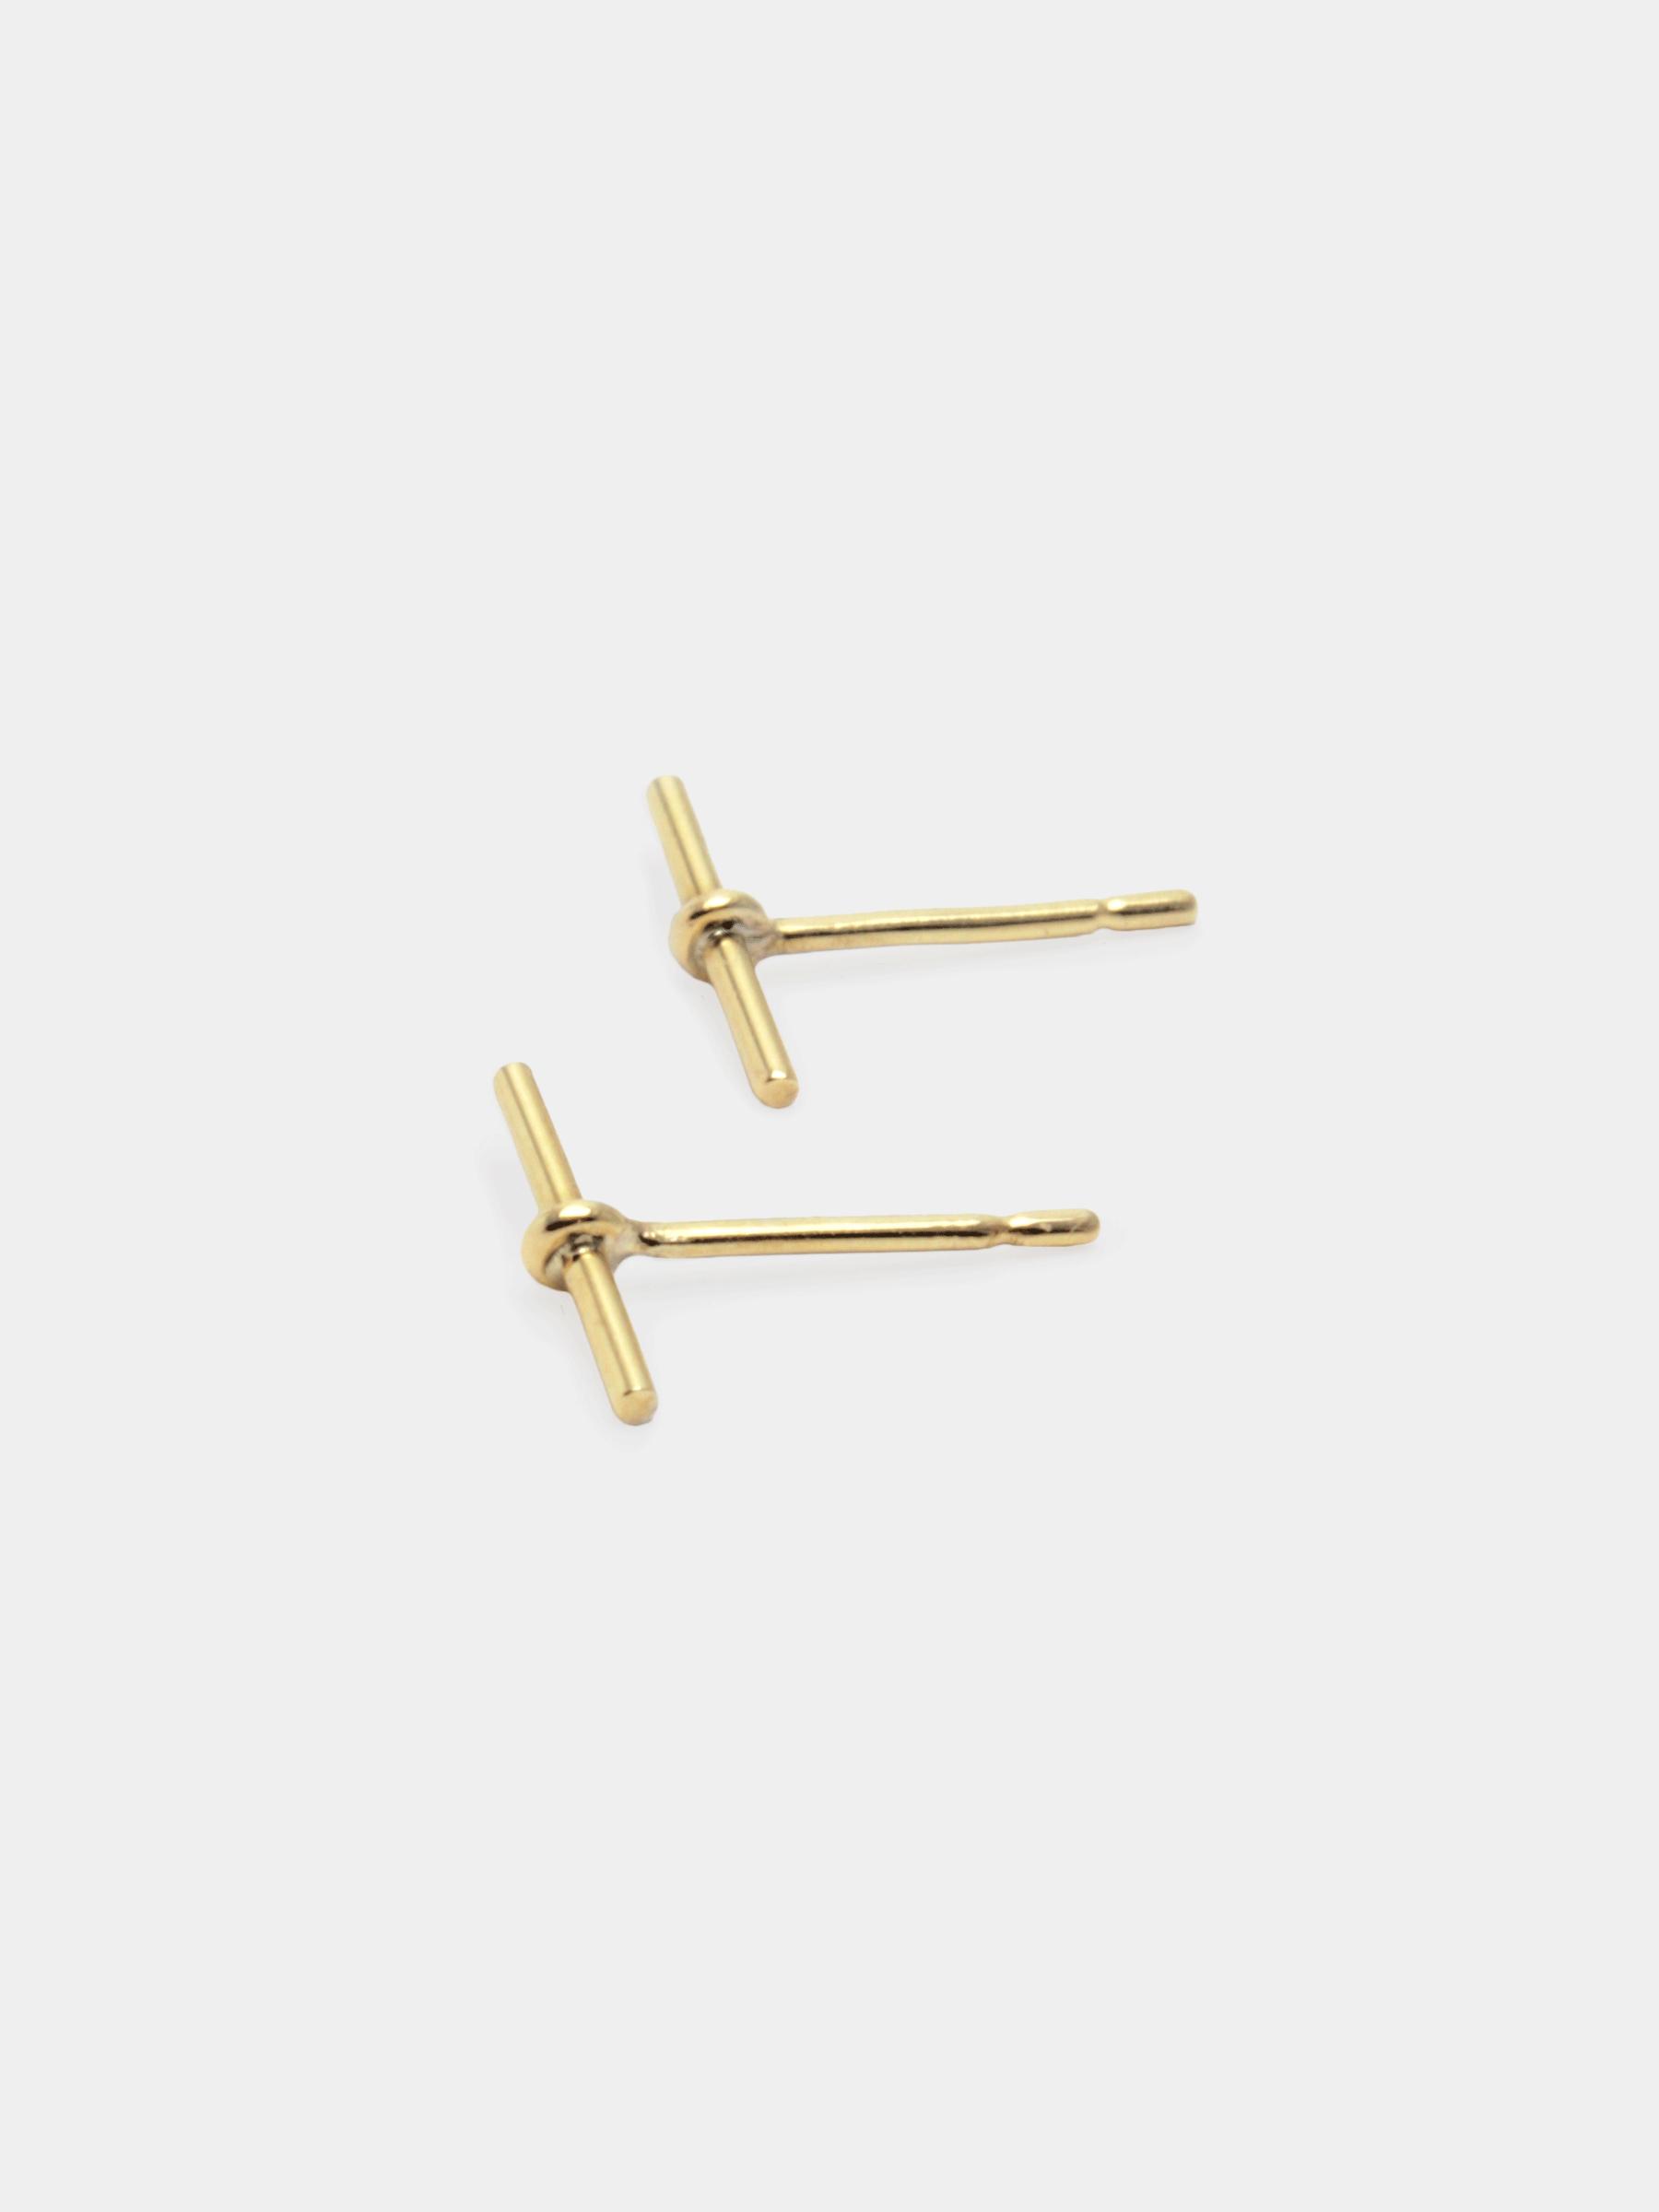 BEPART BAR EARRING Handmade in Bepart studio in Slovakia, the Bar earring is geometric, clean and very polished take on classic earring.